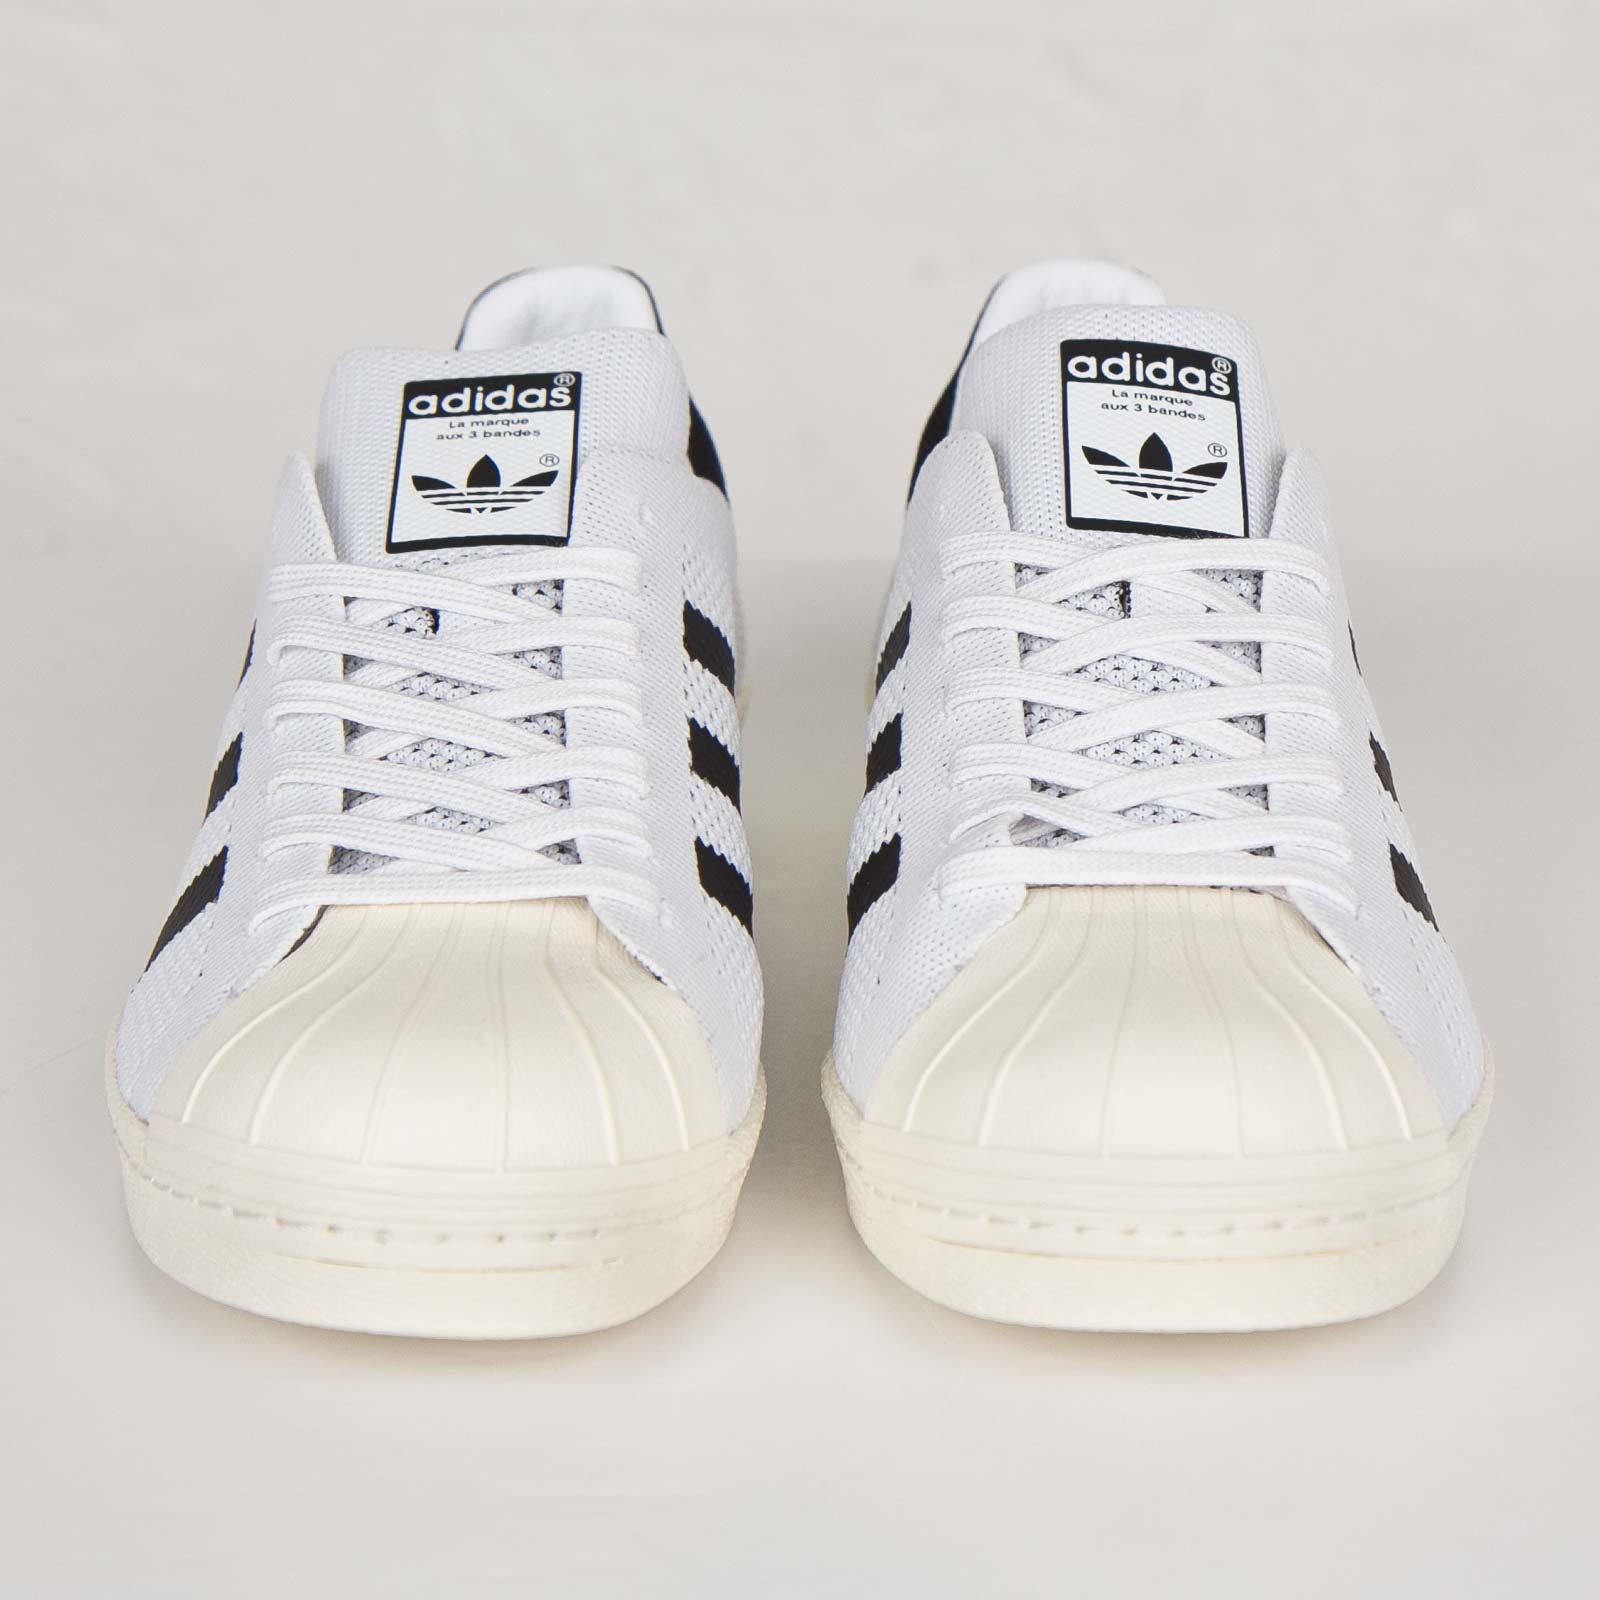 Adidas Superstar 80s PK S77440